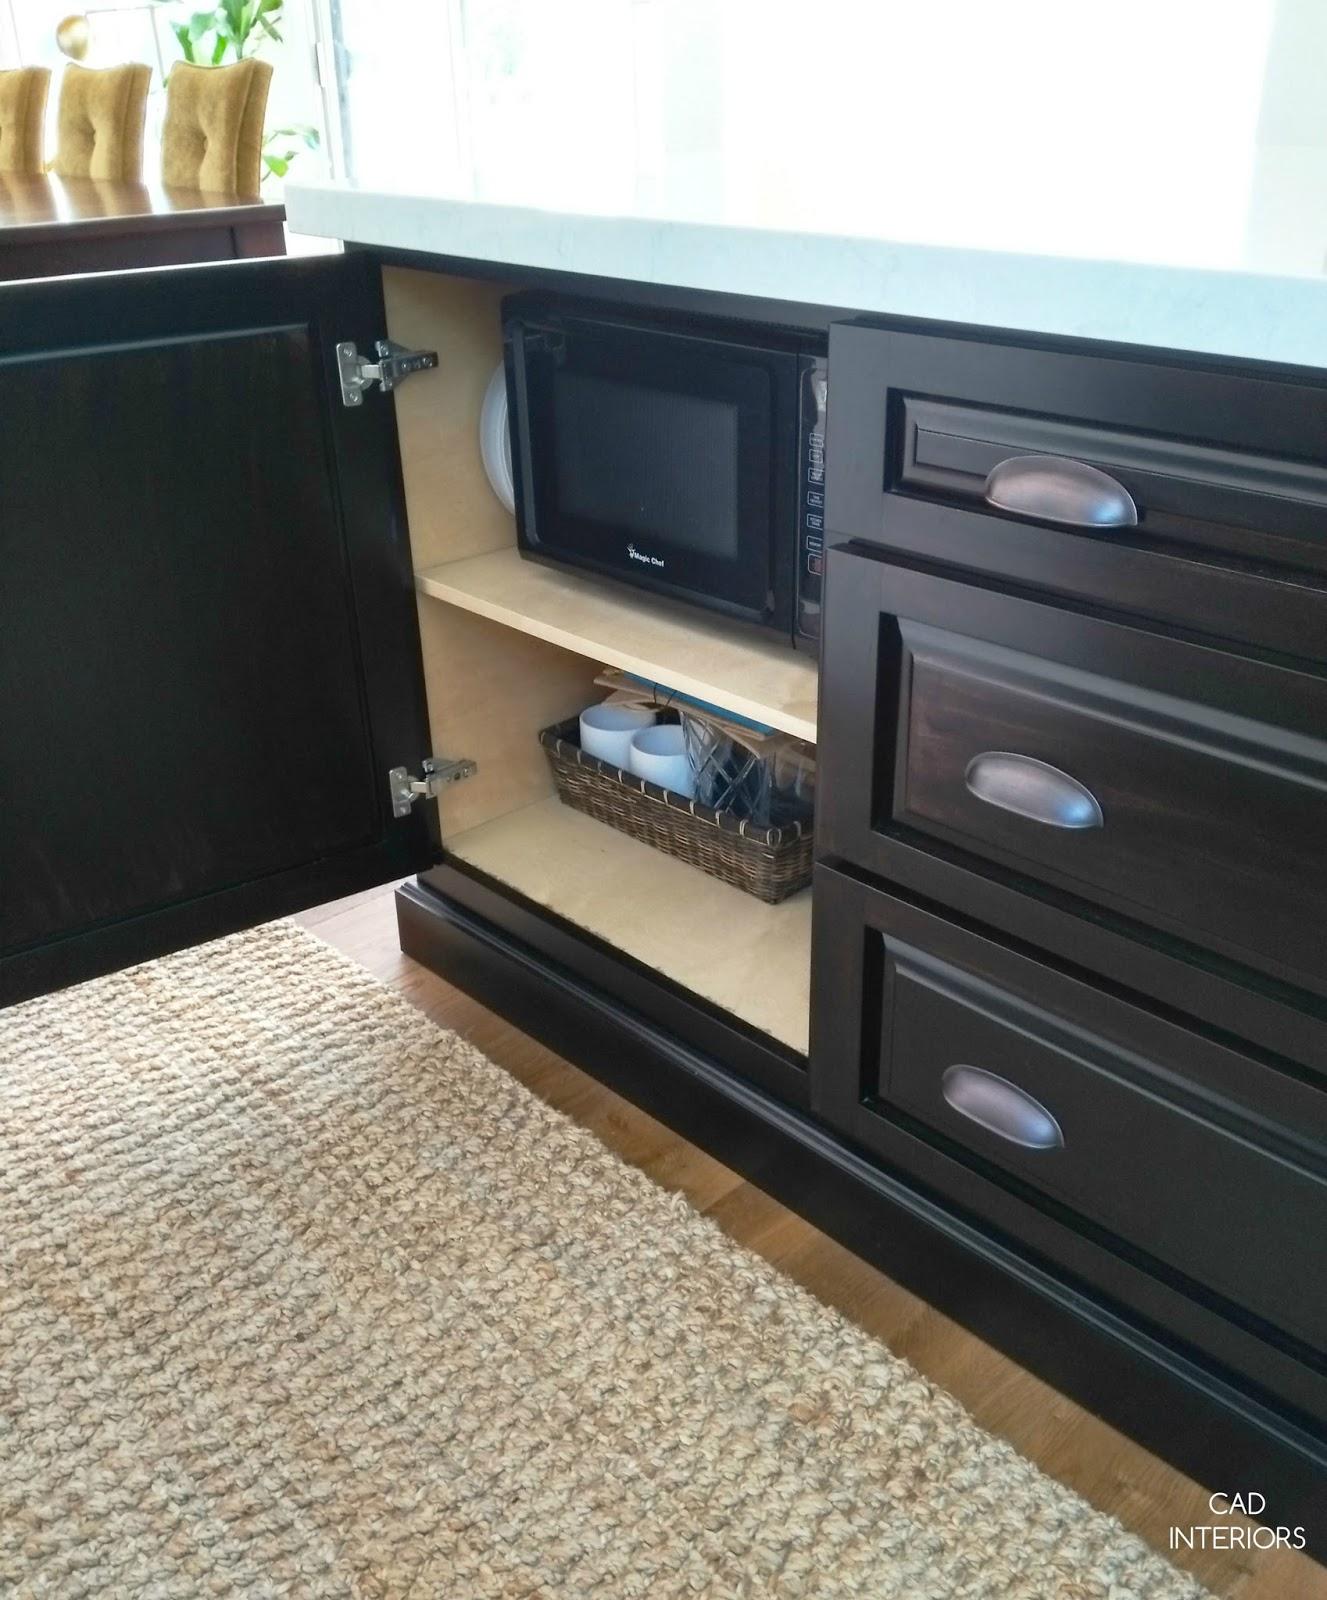 home improvement kitchen renovation remodel ideas storage solutions